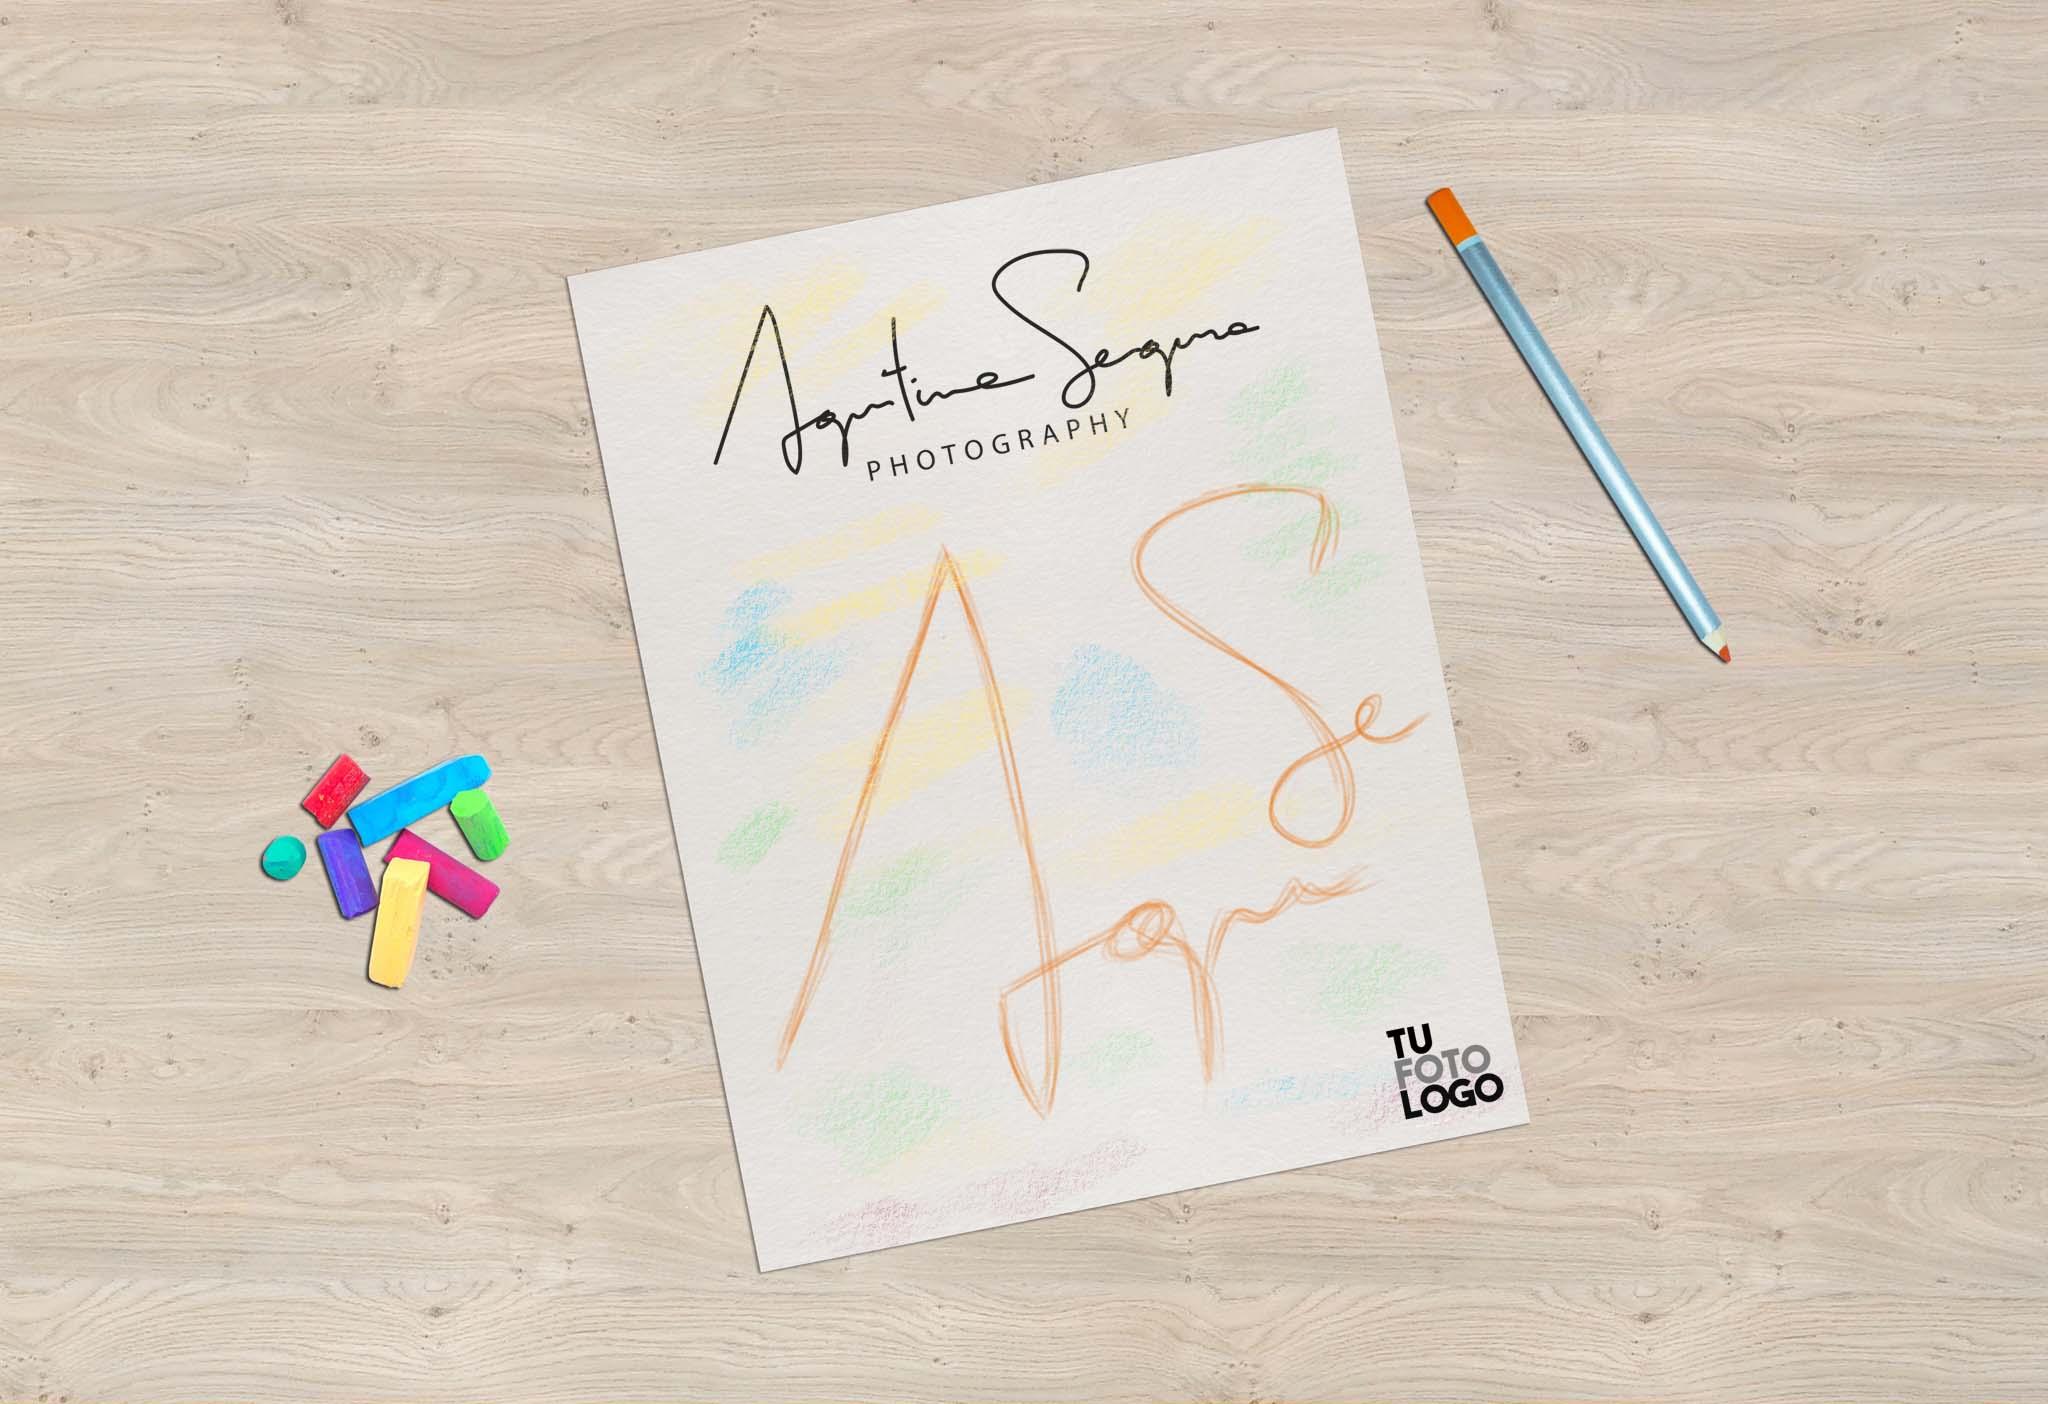 Un nuevo logo para Agustina